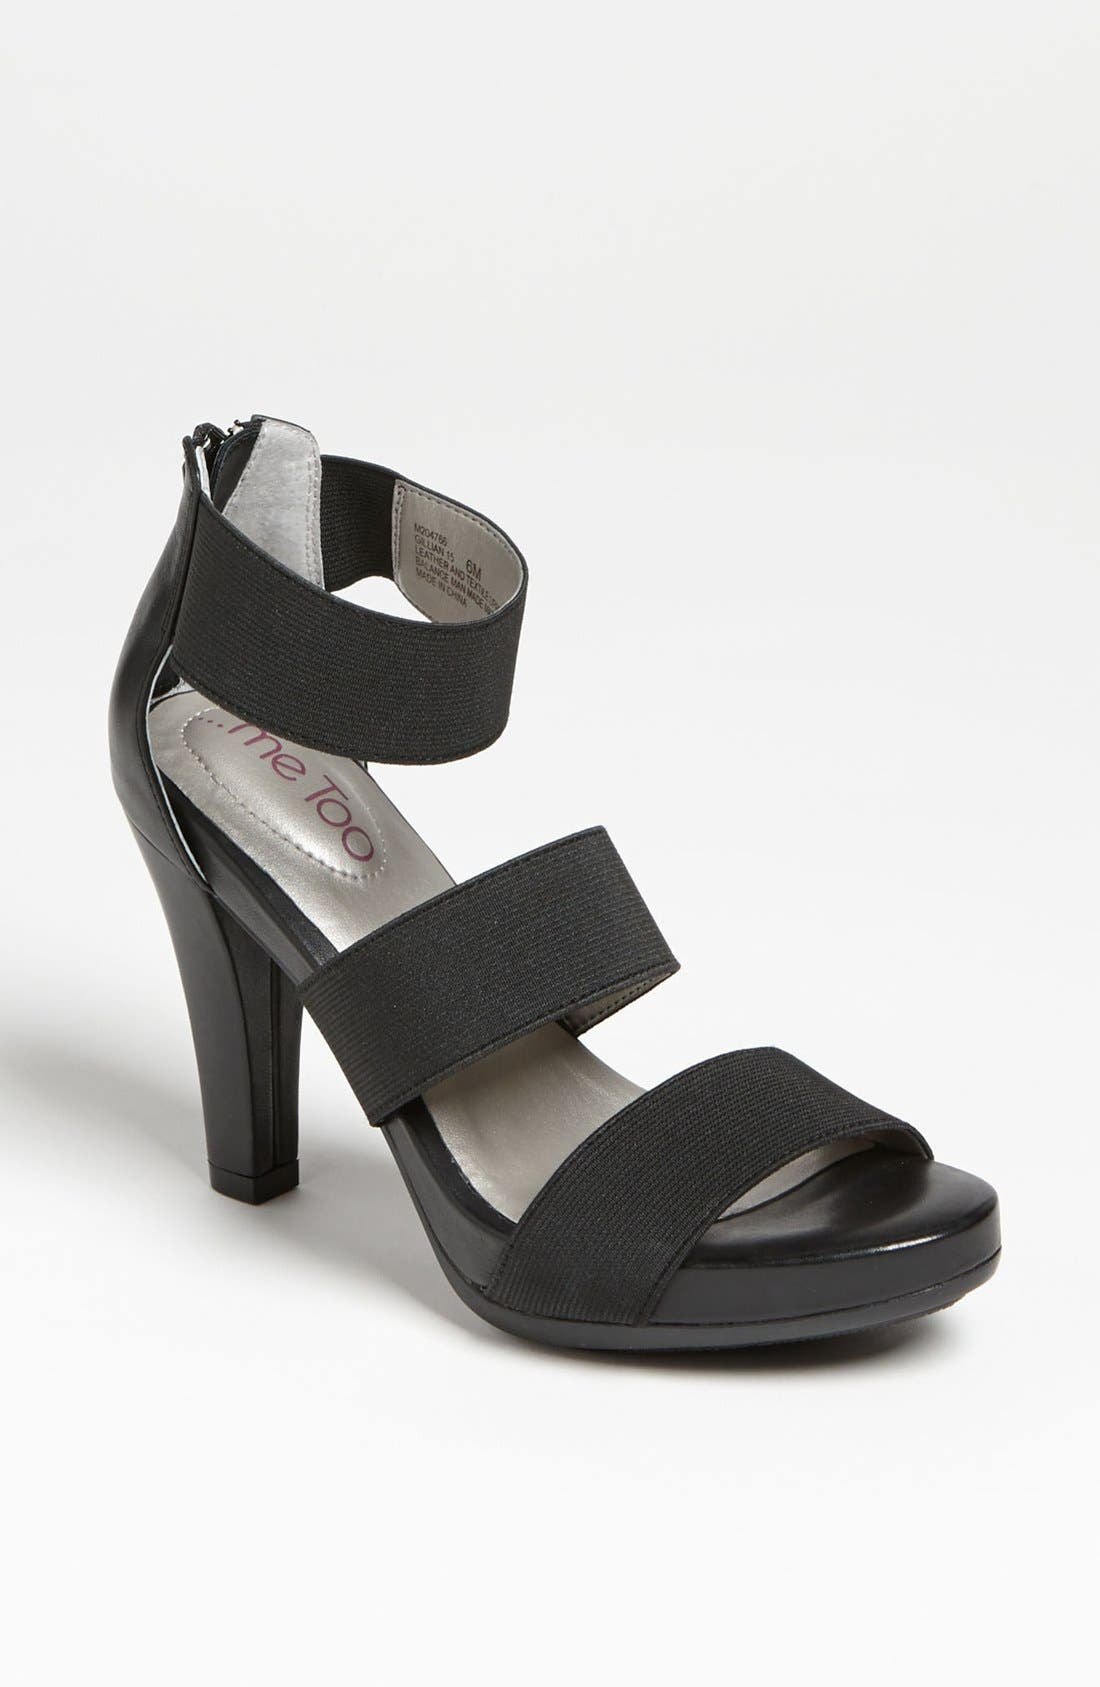 Alternate Image 1 Selected - Me Too 'Gillian' Sandal